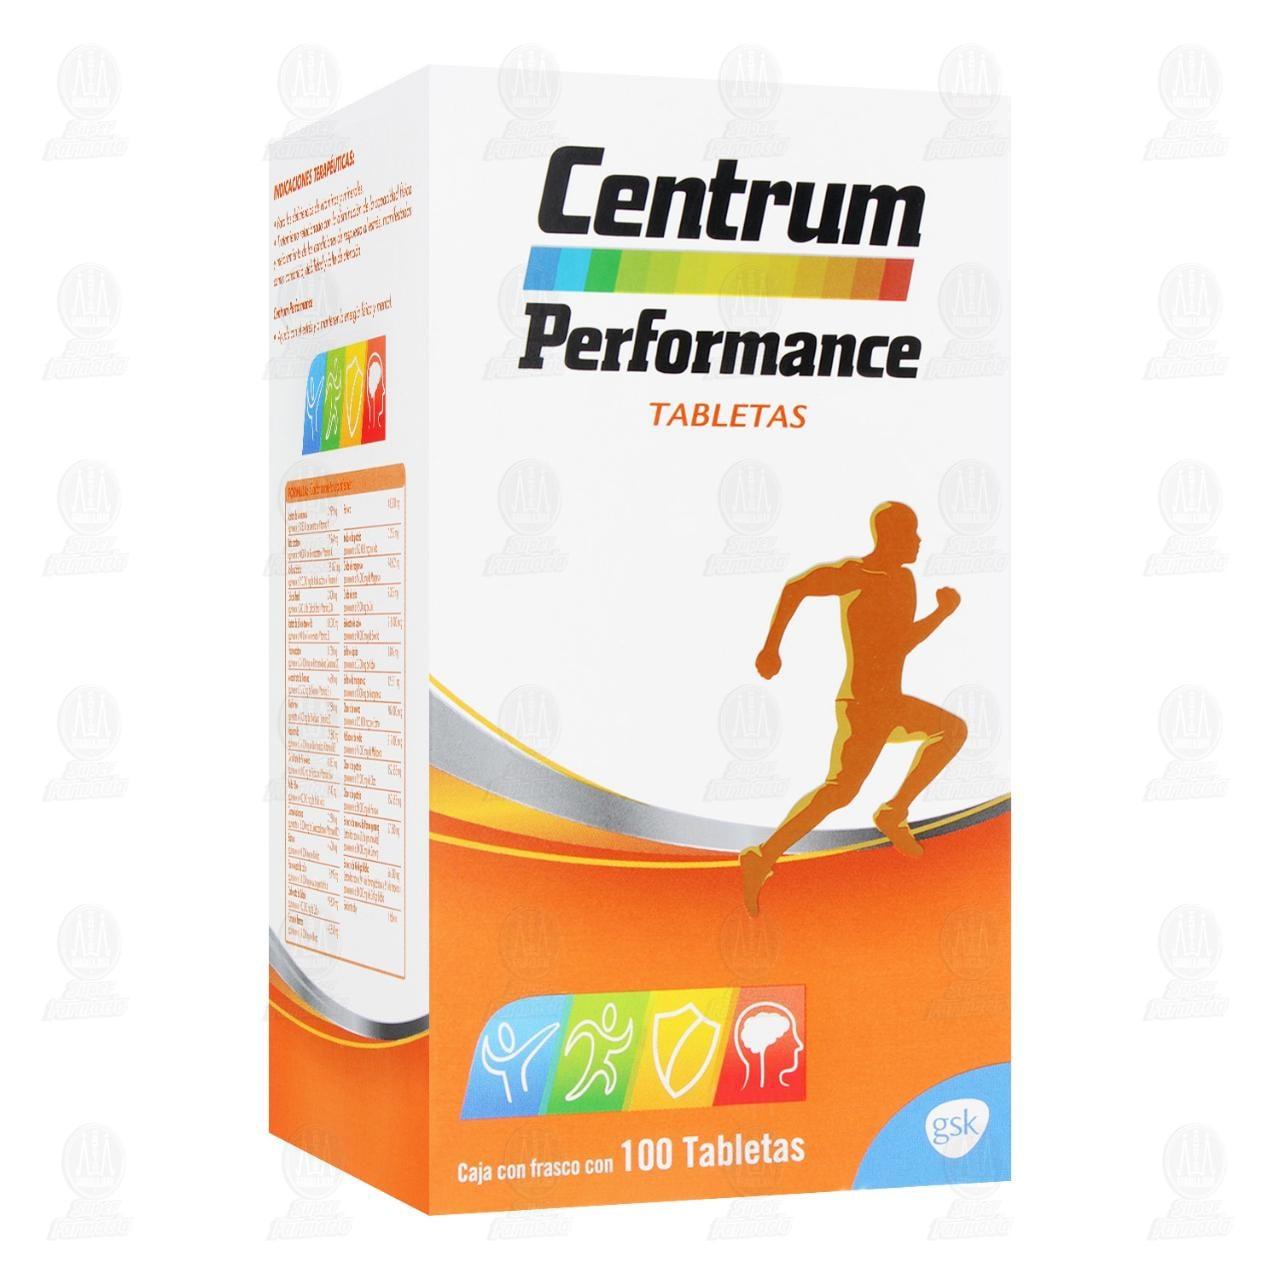 Centrum Performance 100 Tabletas